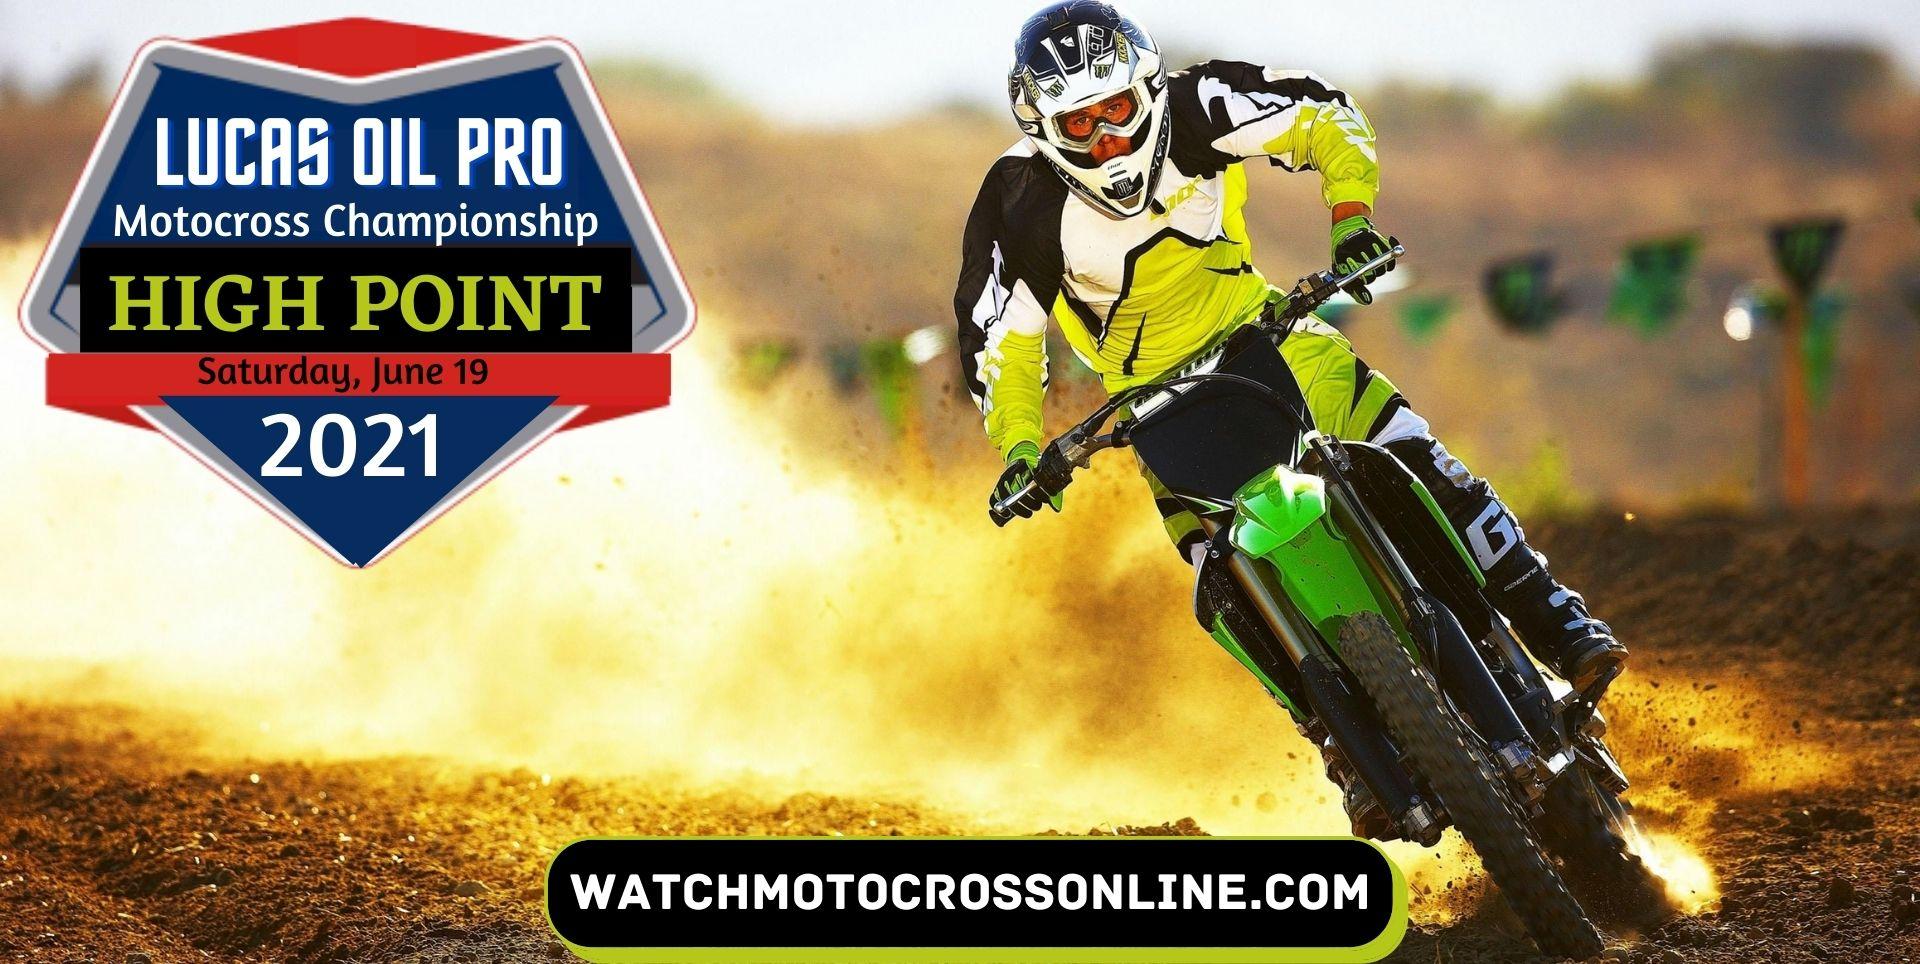 High Point Motocross Live Stream 2021